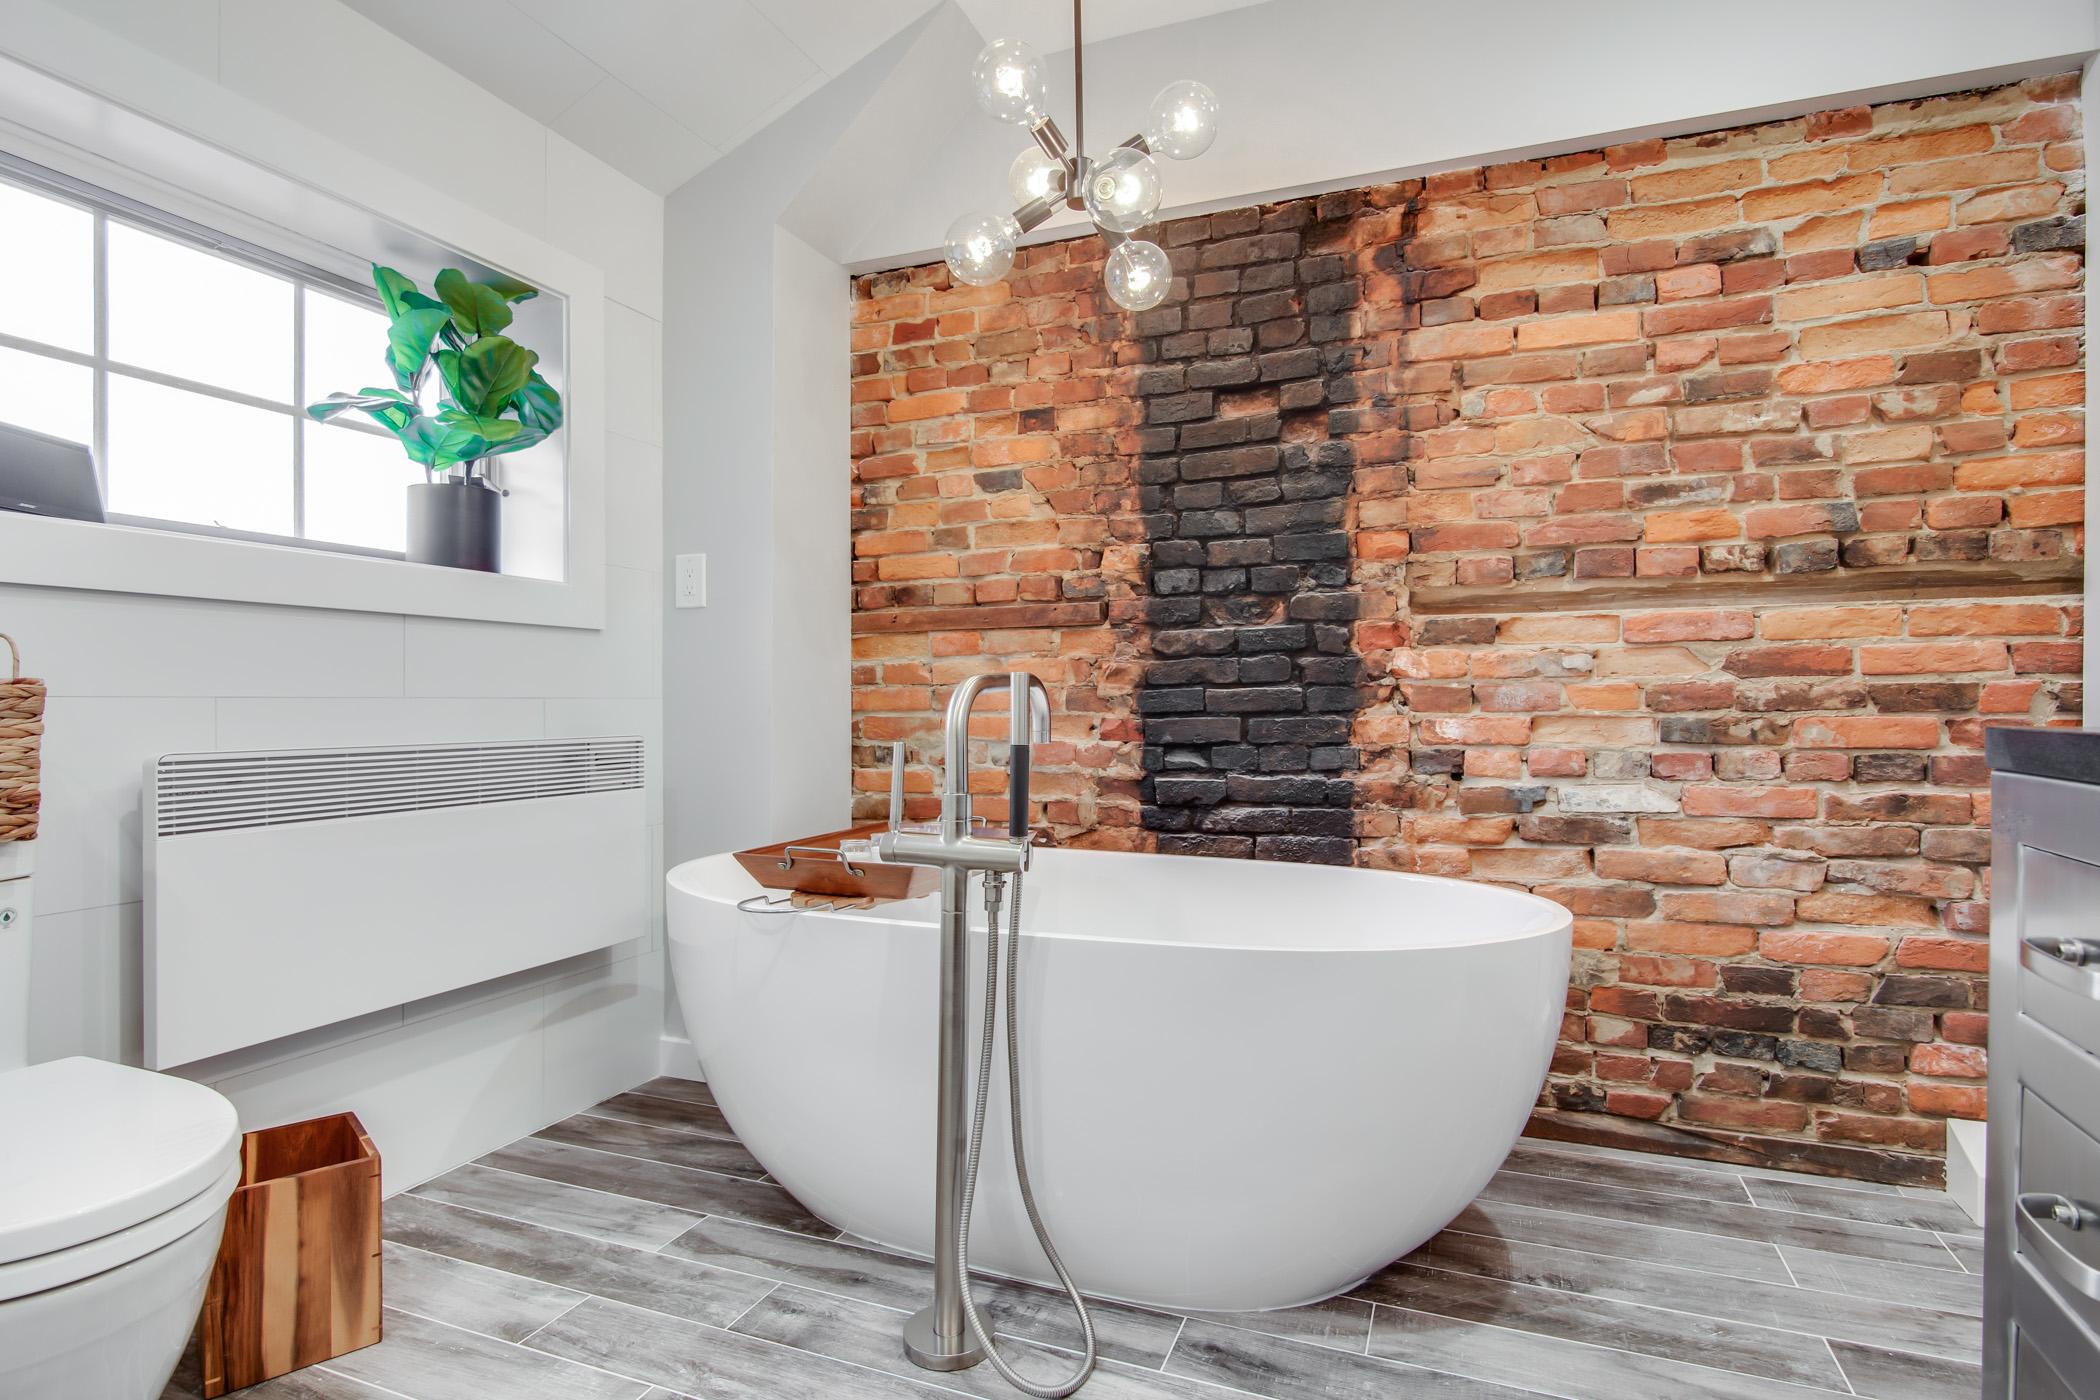 Cranbury NJ Bathroom Remodel - Brombacher - DES Home ...